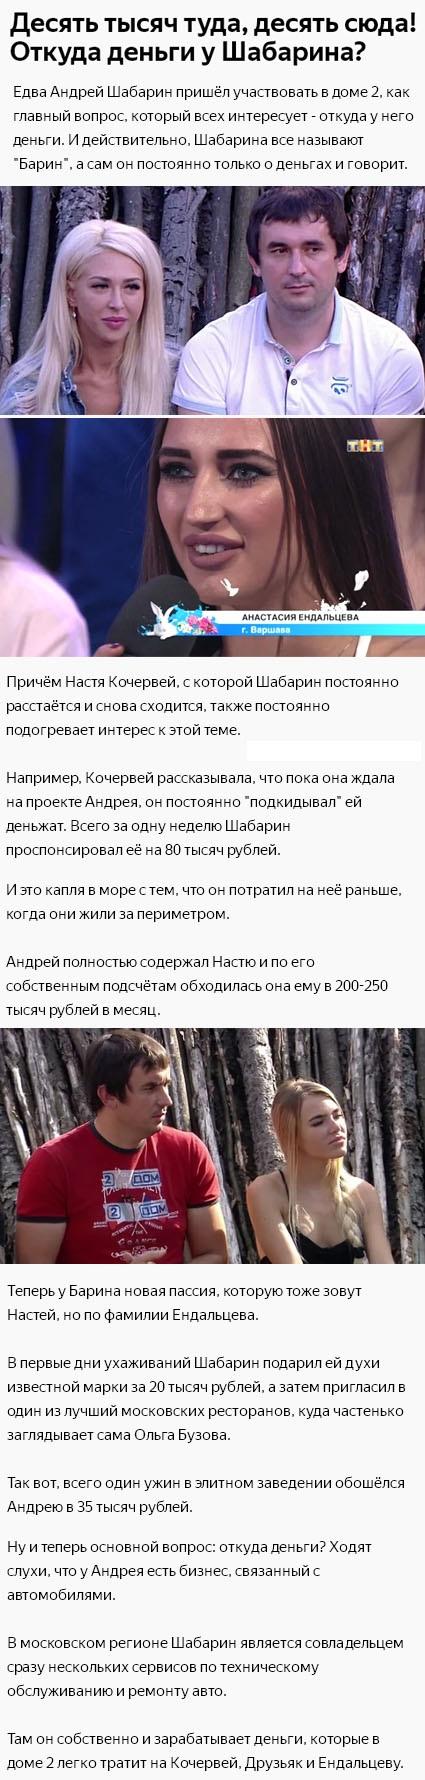 Источник богатства Андрея Шабарина